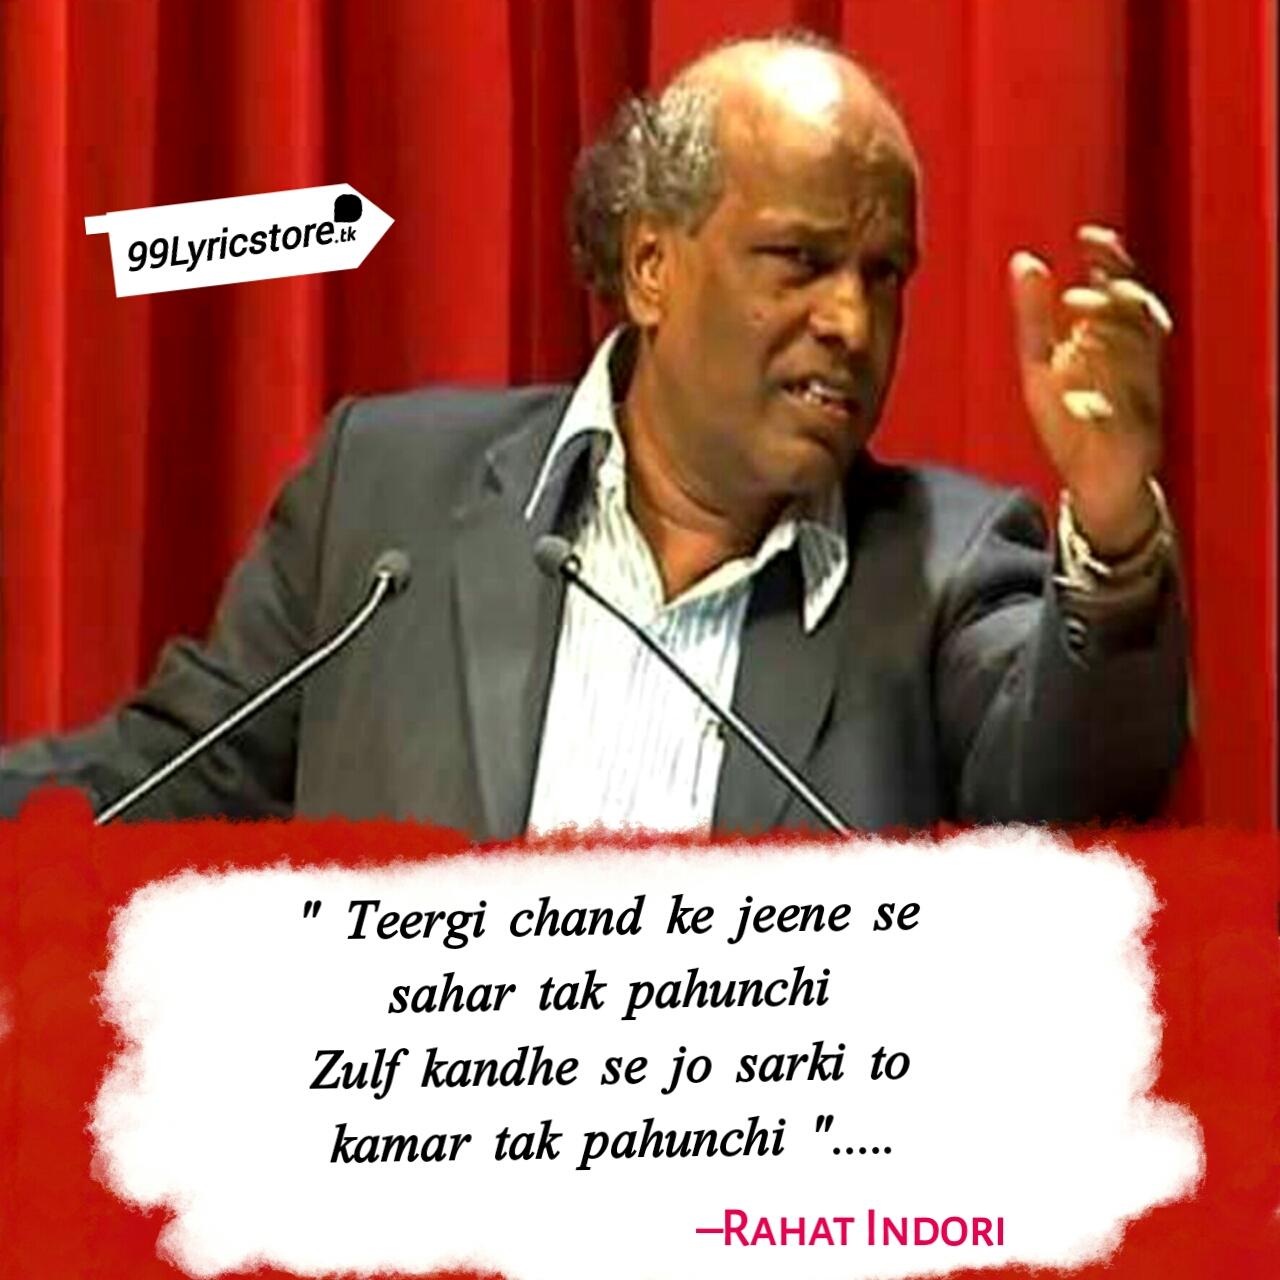 Teergi chand ke jeene se sahar tak pahunchi – Rahat Indori | Ghazal Poetry, Teergi chand ke jeene se sahar tak pahunchi lyrics, Quotes image, Rahat Indori image, shayari, two line quotes